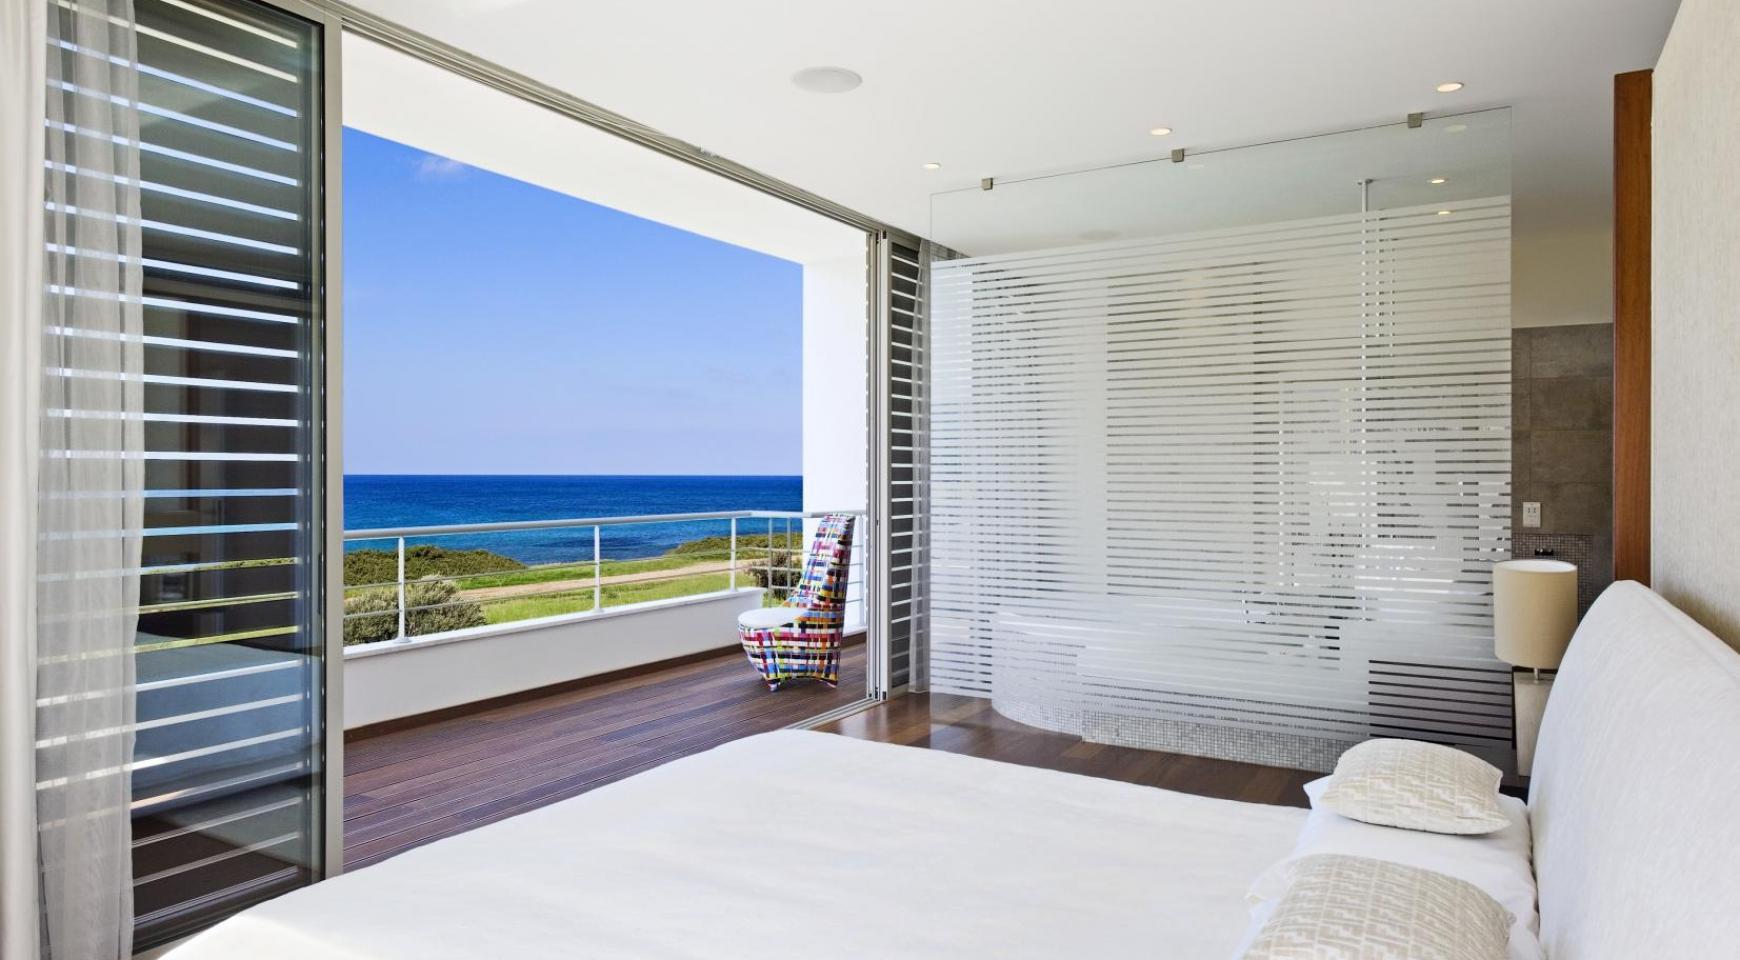 4 Bedroom Villa with Sea Views near Latsi - 9